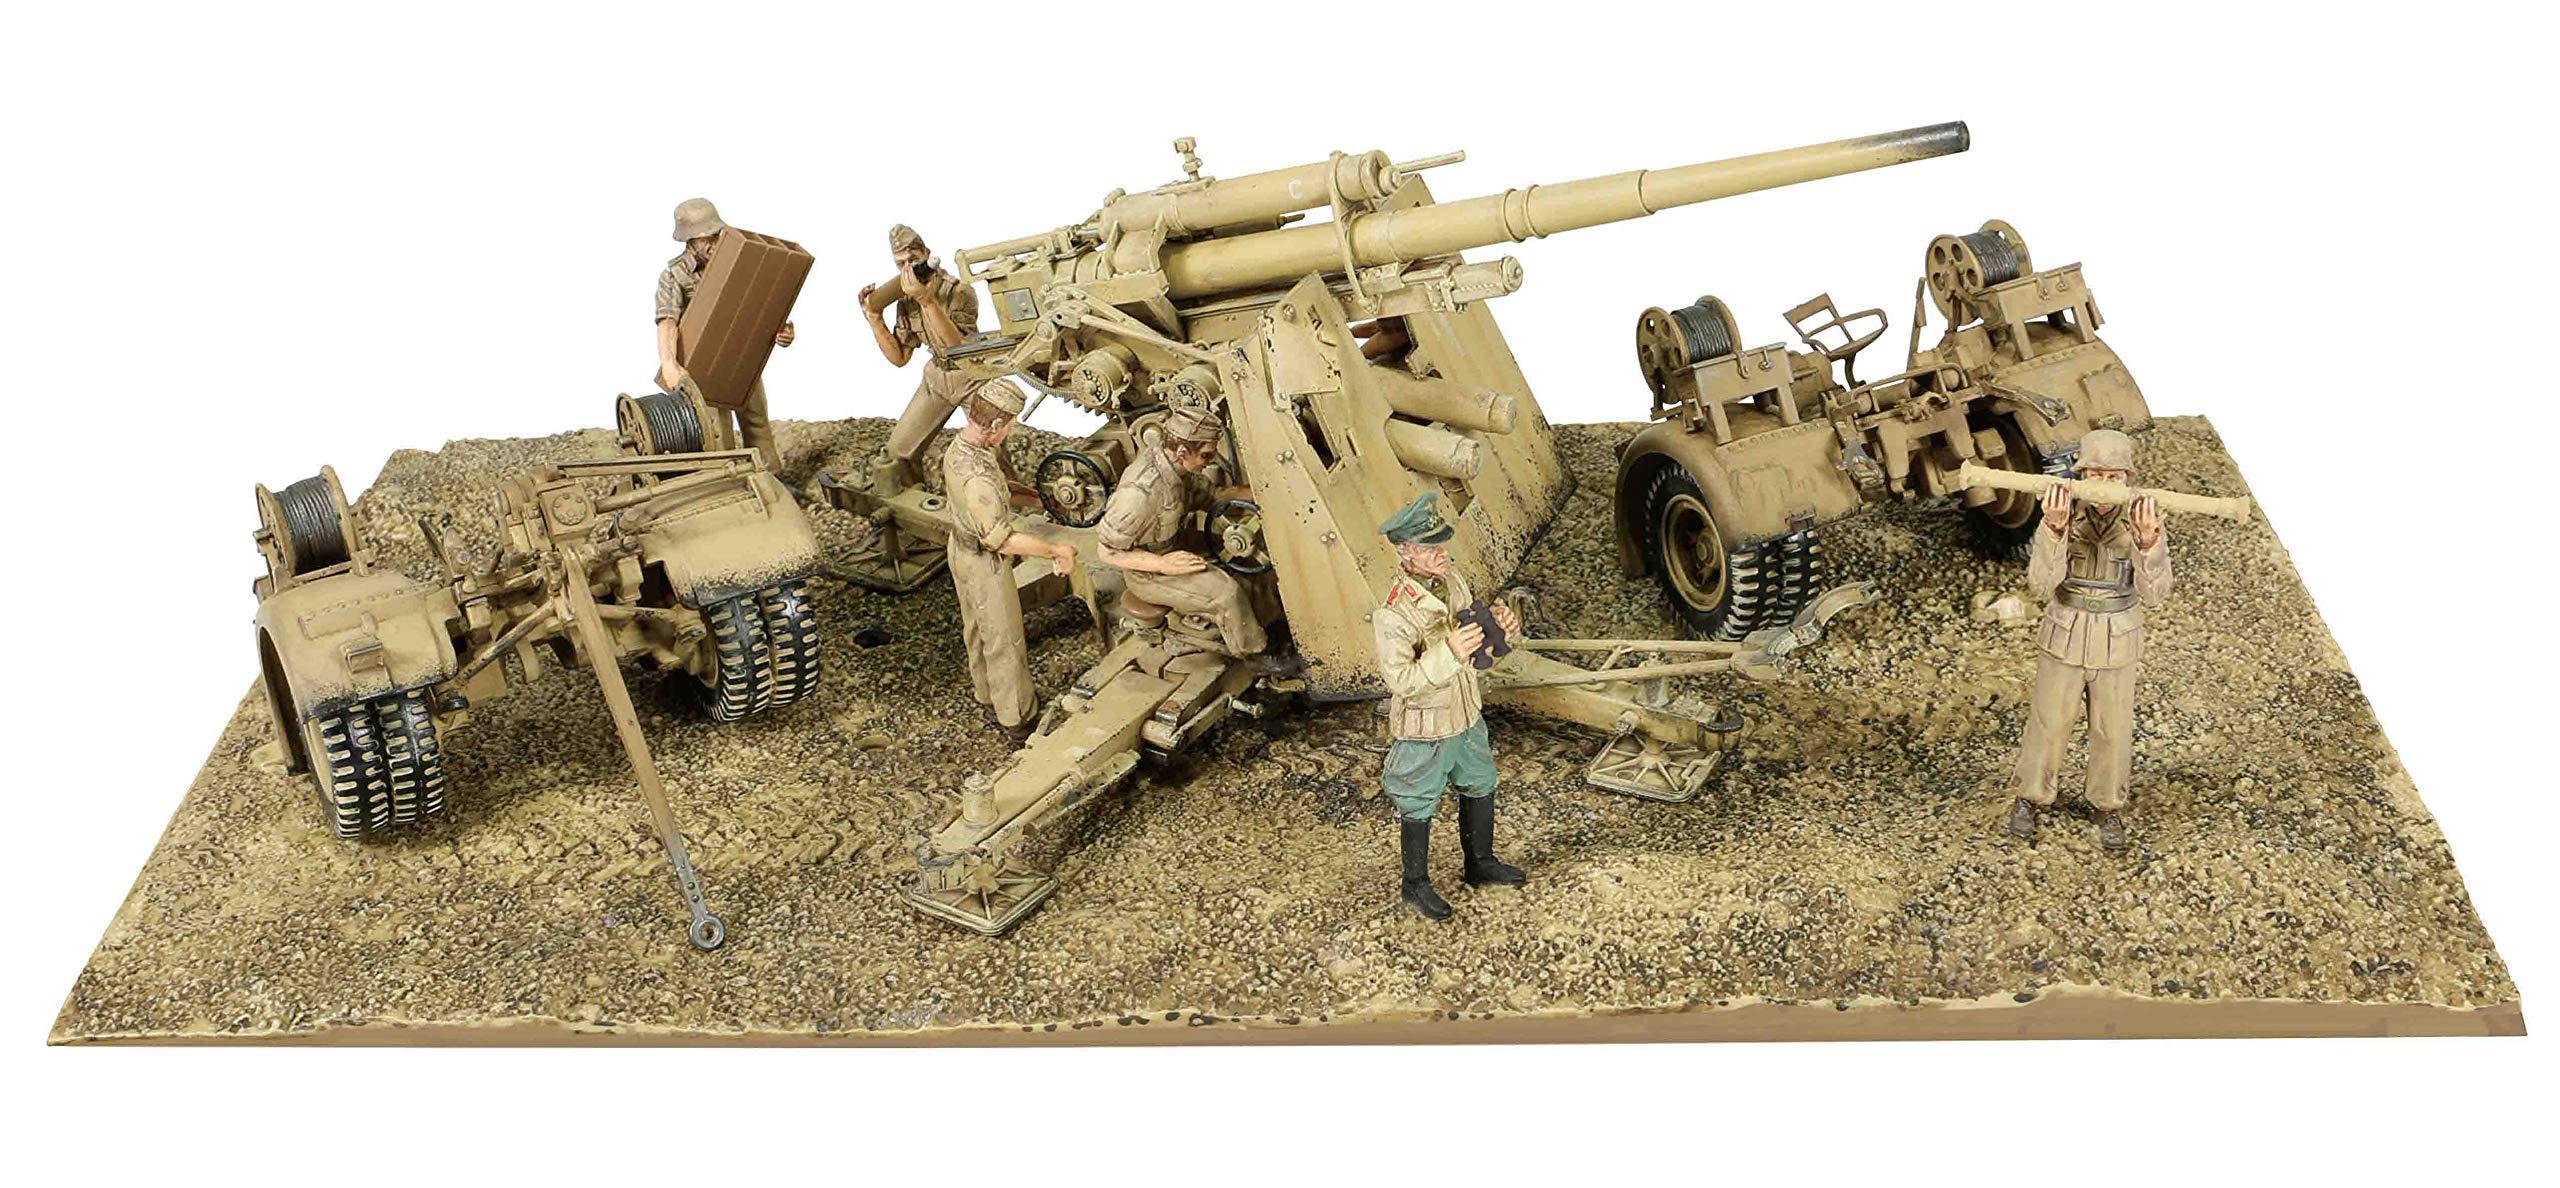 Forces of Valor 1:32 German 88mm Flak 36/37 Anti-Aircraft Gun with Trailer - DAK, El Alamein, North Africa, 1942